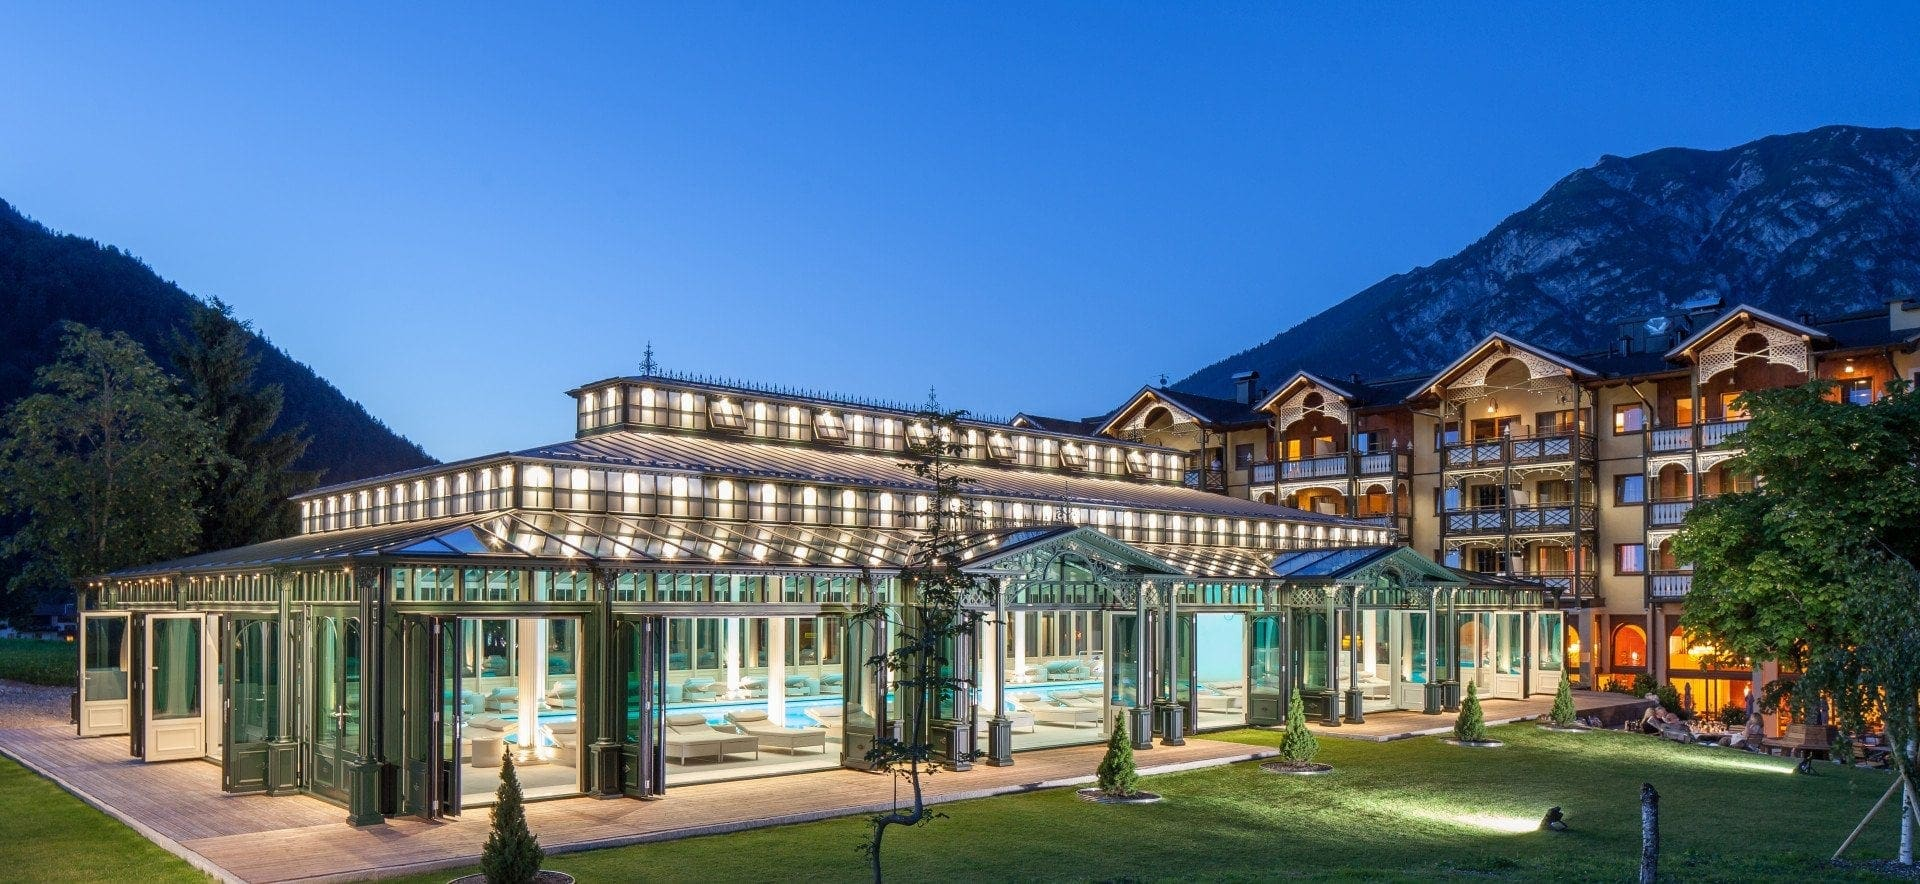 Beste Wellneb Hotels